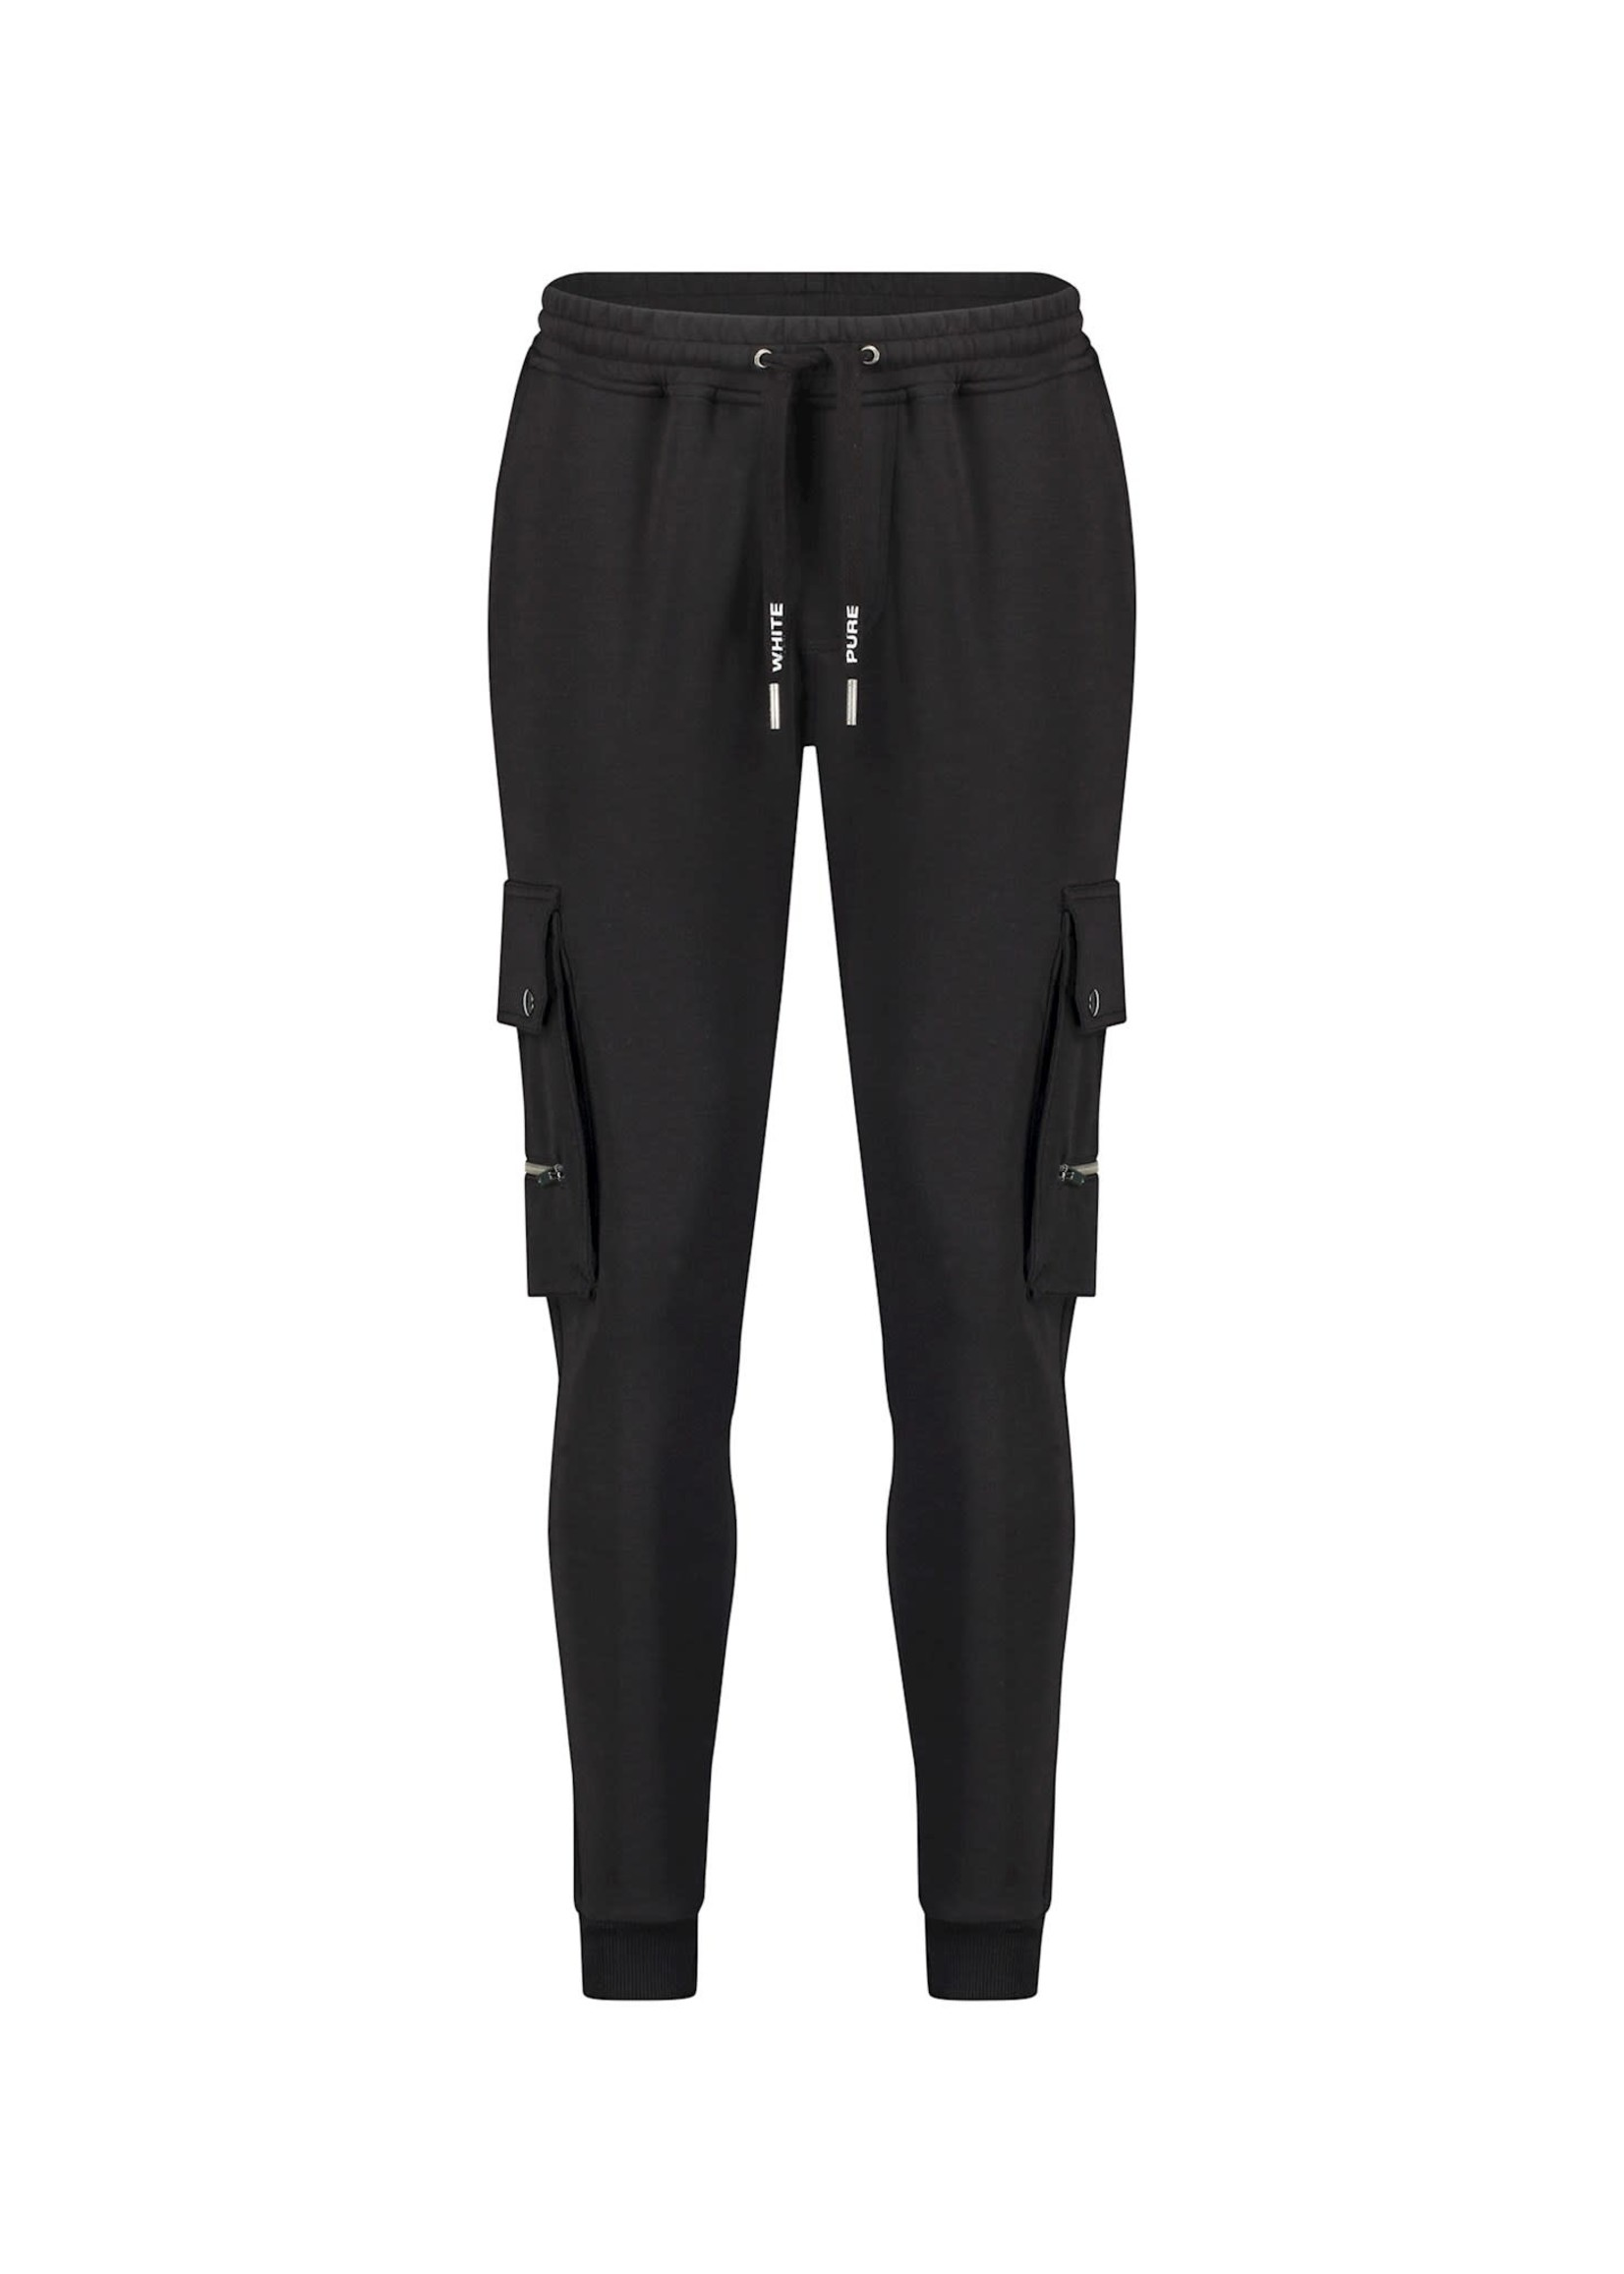 Purewhite Utility Pocket Sweatpants - Black